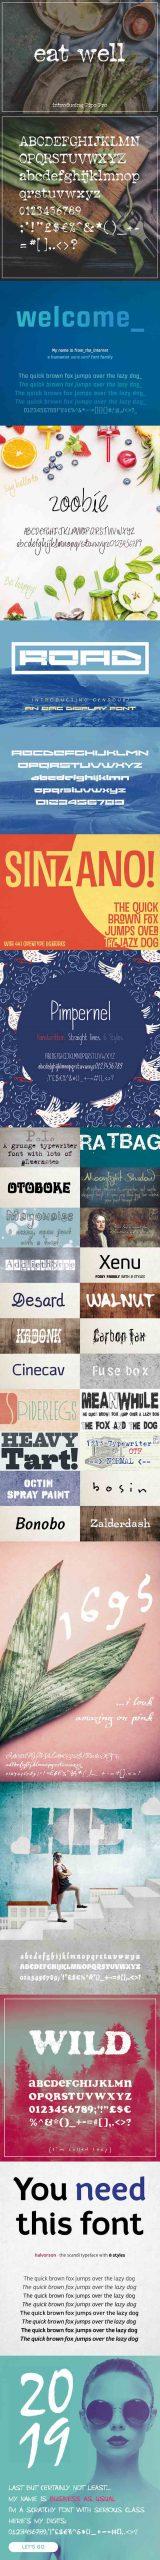 PRO Fonts 2019 - A Bundle Of Professional Fonts